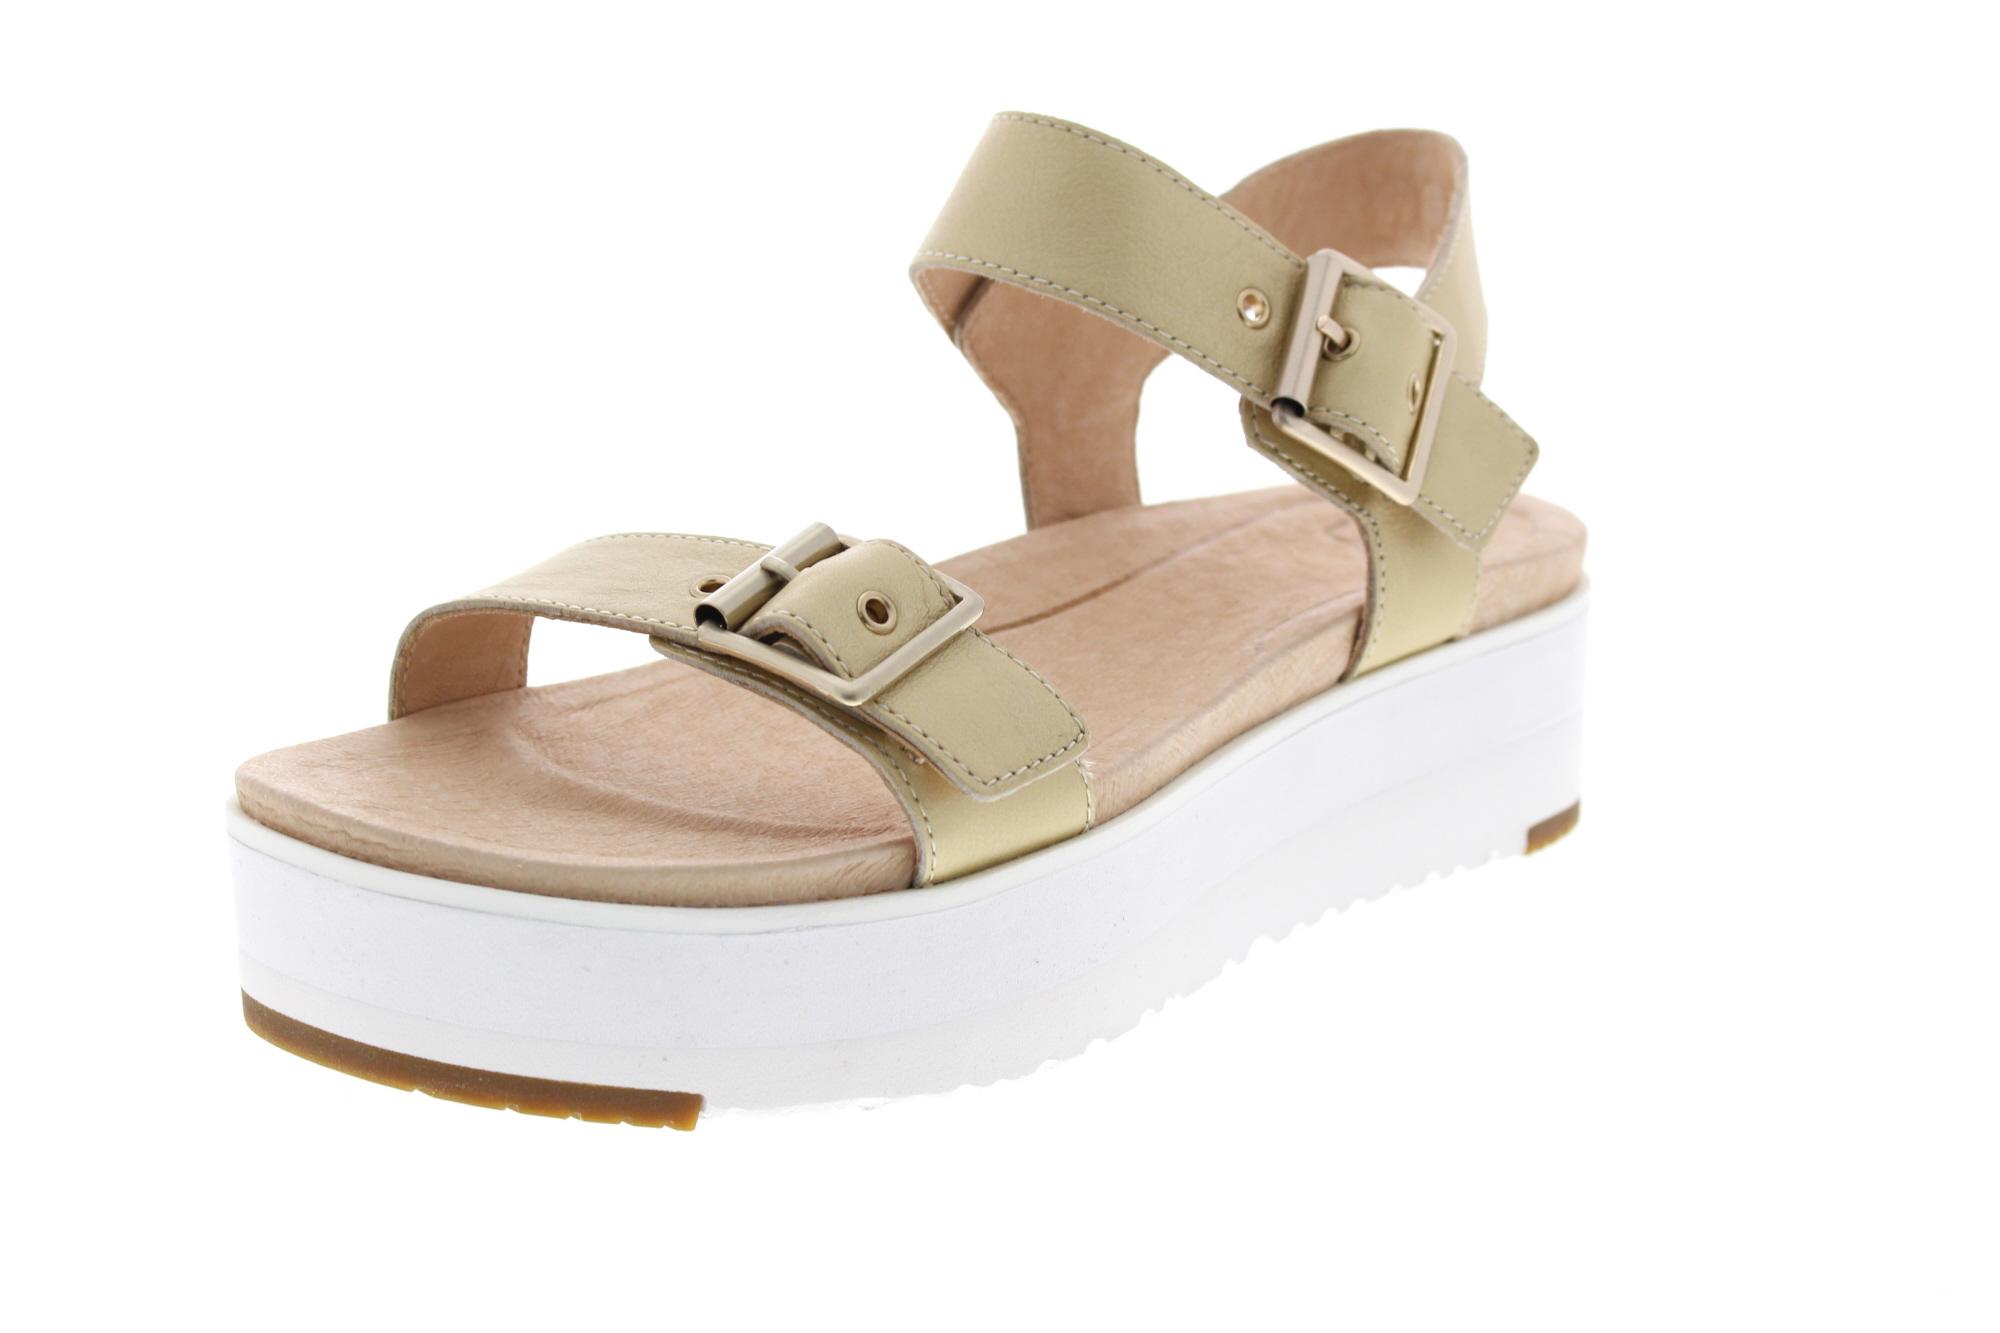 UGG Damenschuhe - Sandalette ANGIE METALLIC - gold_0